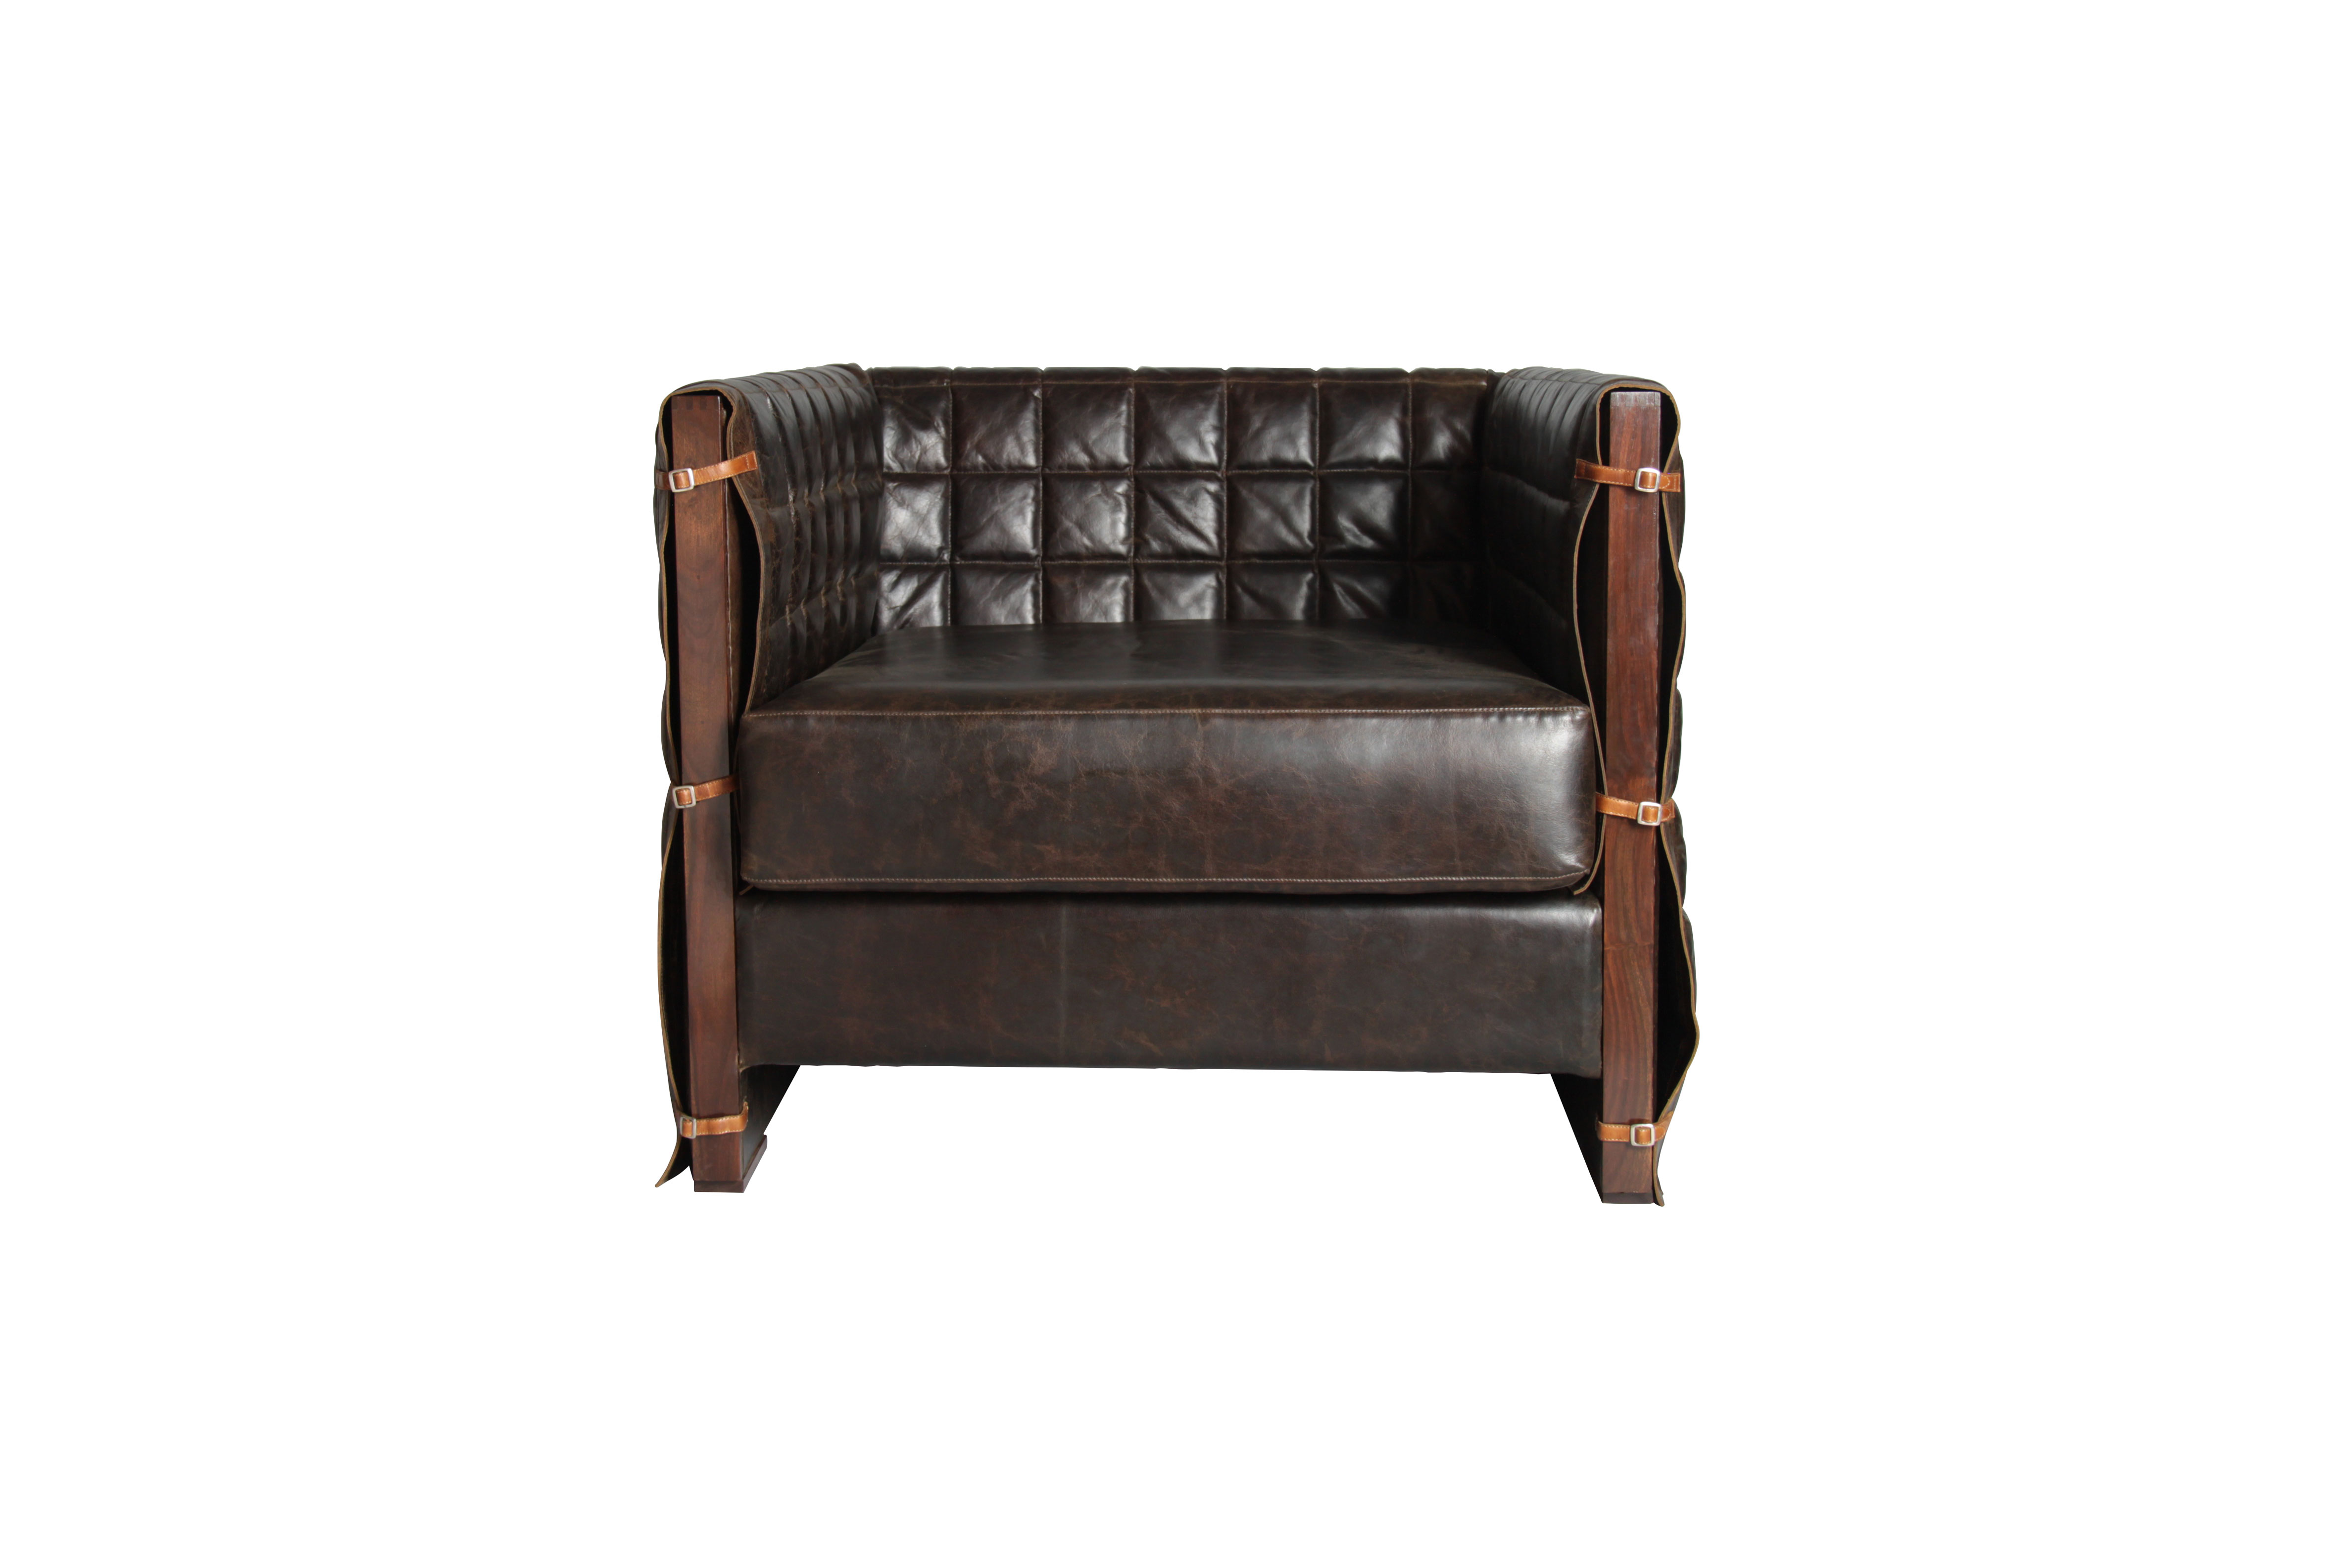 Retro Blanket Sofa Single Seater